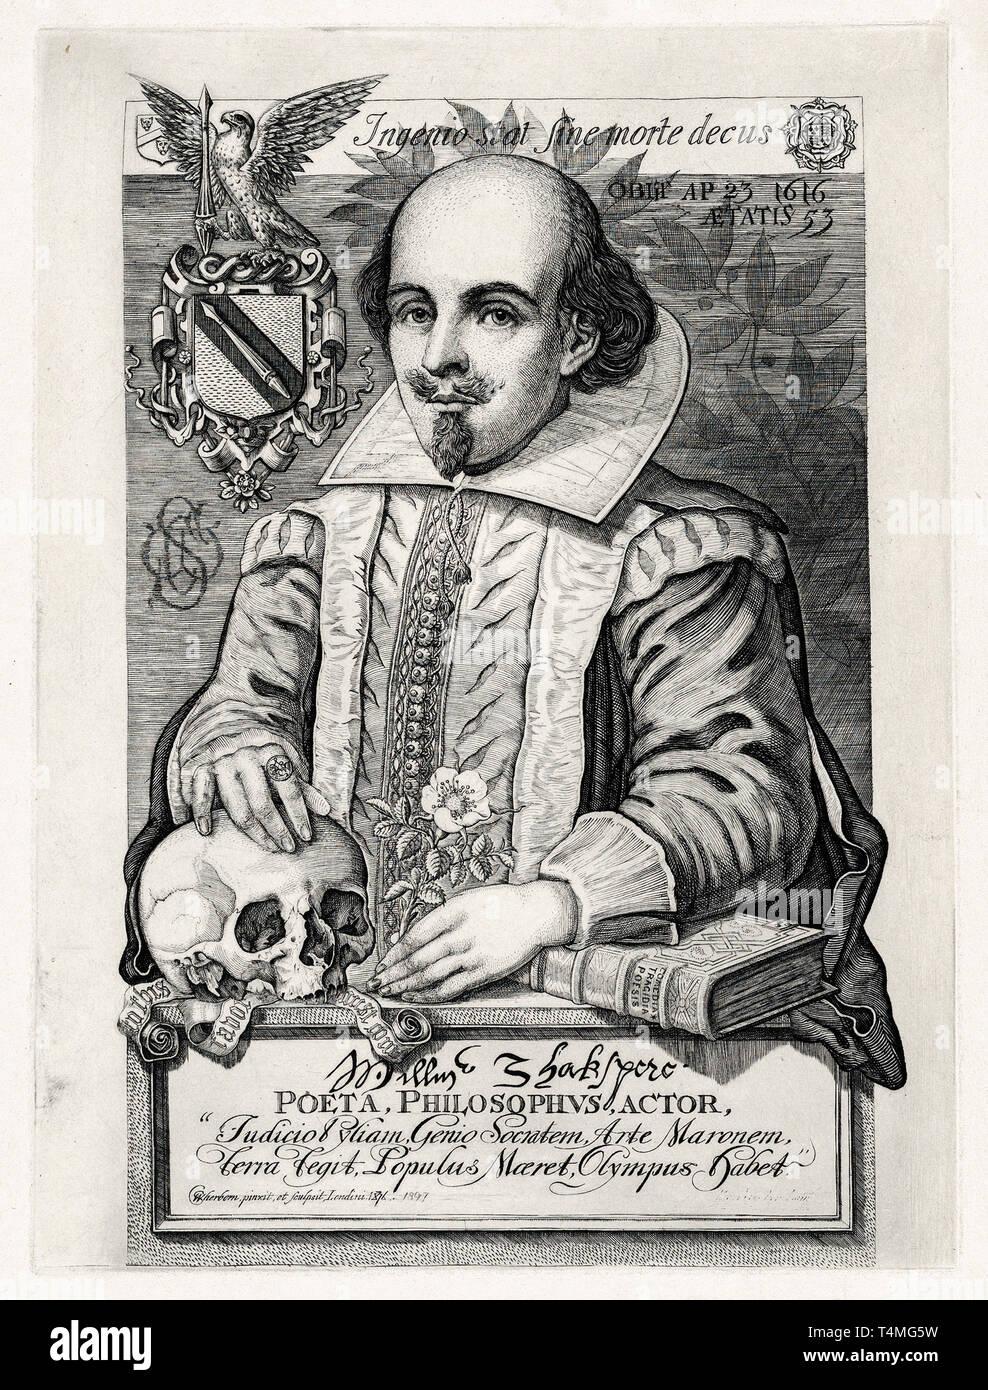 William Shakespeare (1564–1616), portrait engraving, Charles William Sherborn, 1876 Stock Photo